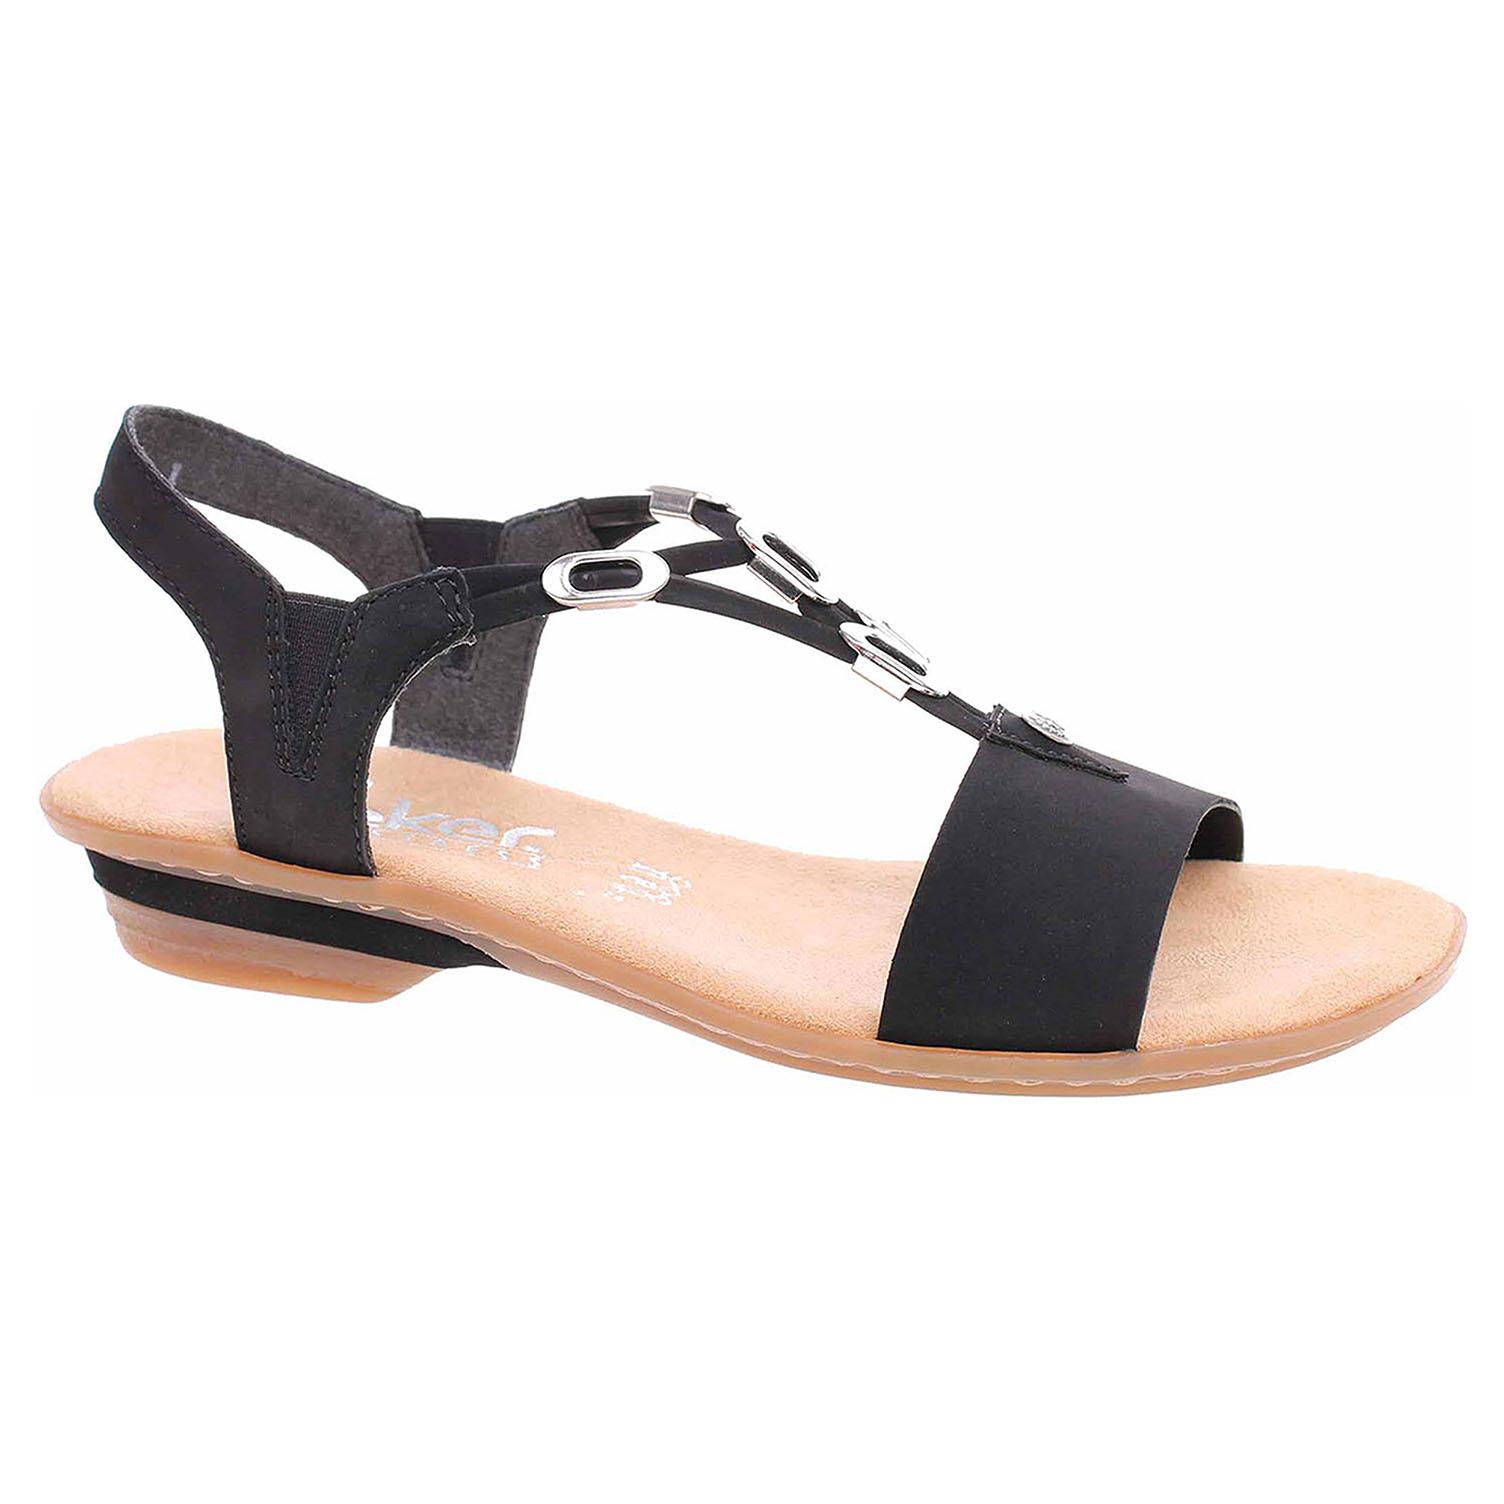 e179c6fac5ca detail Dámske sandále Rieker 63453-00 schwarz